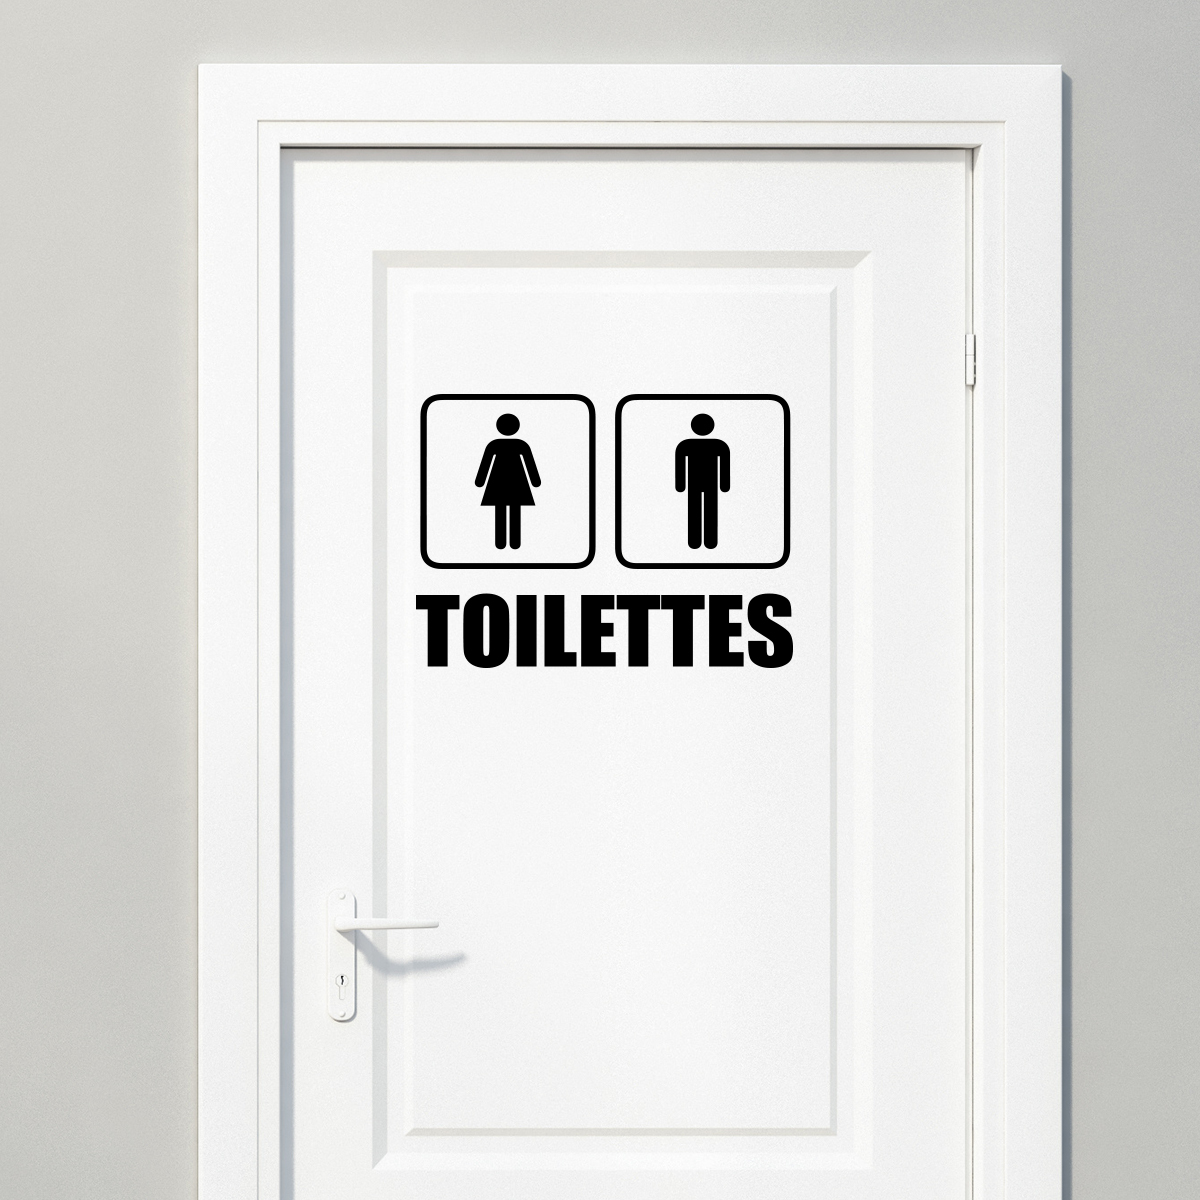 Sticker Toilettes Homme femme  Stickers STICKERS TOILETTES Porte  ambiancesticker